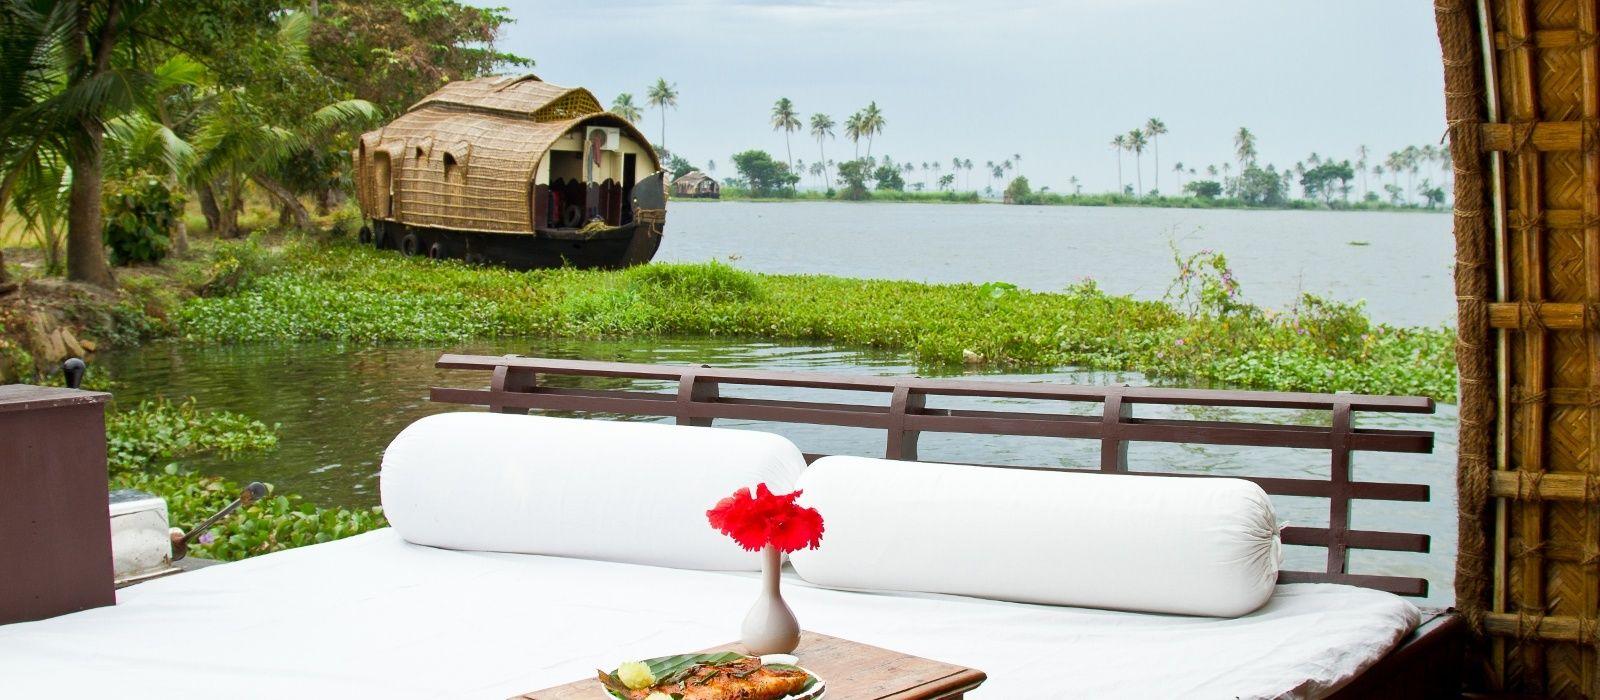 Kerala: Backwater & Plantagen Urlaub 5